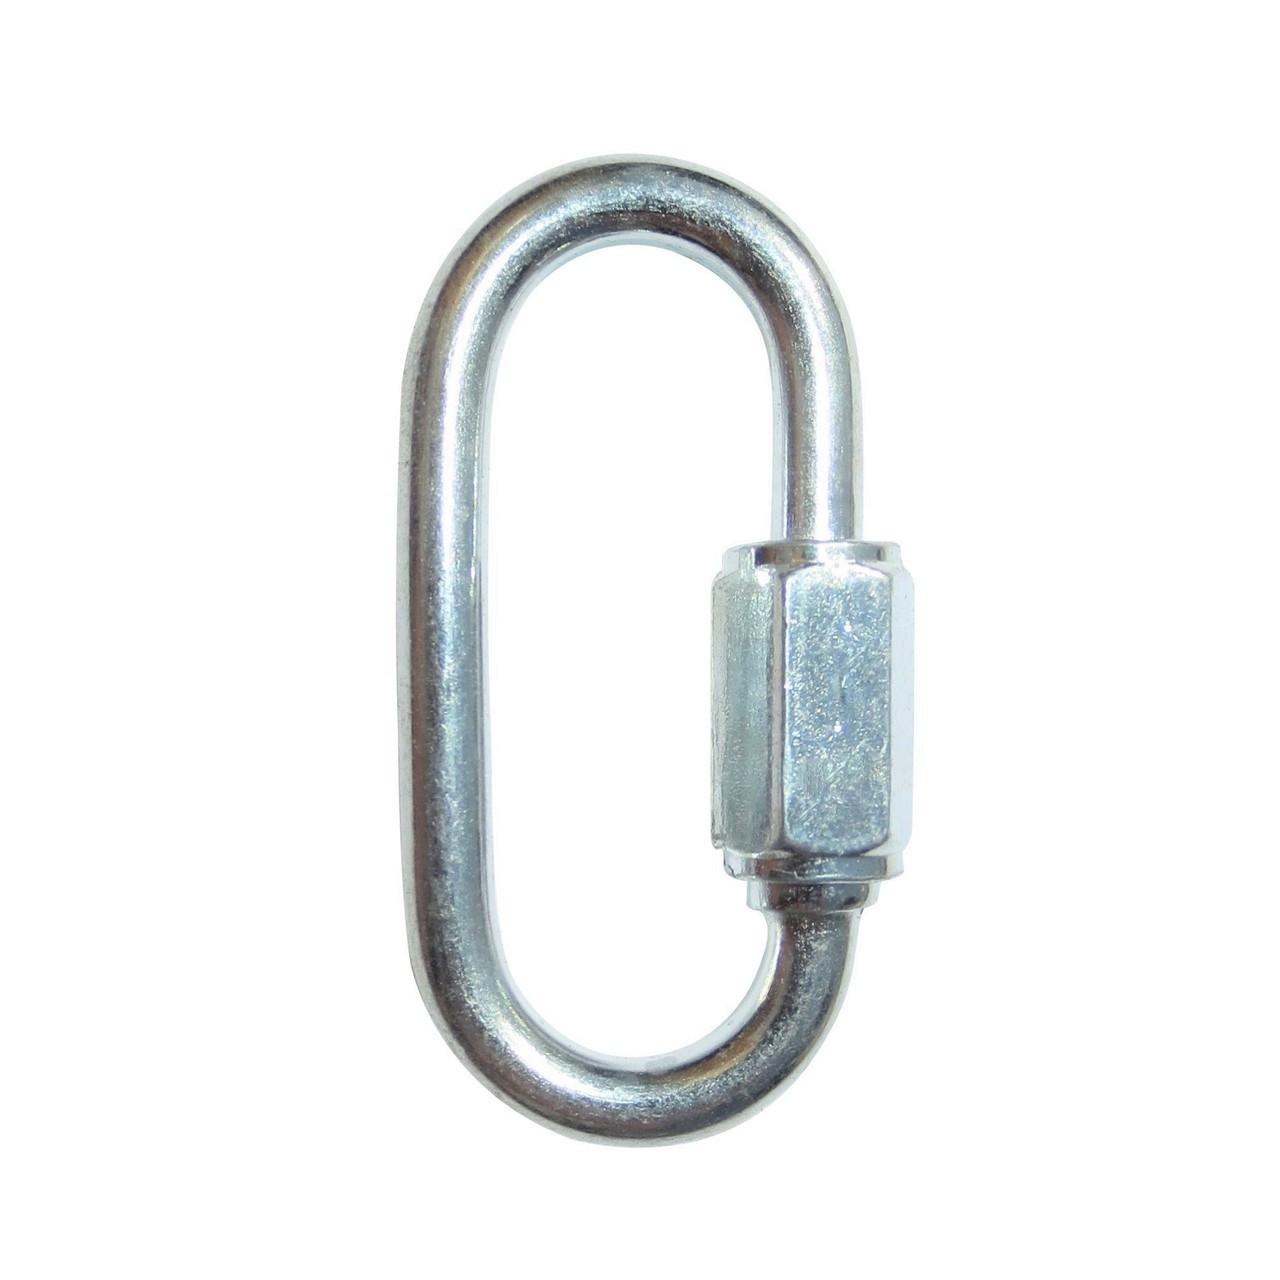 Quick Links - 6.0mm - Zinc Plated